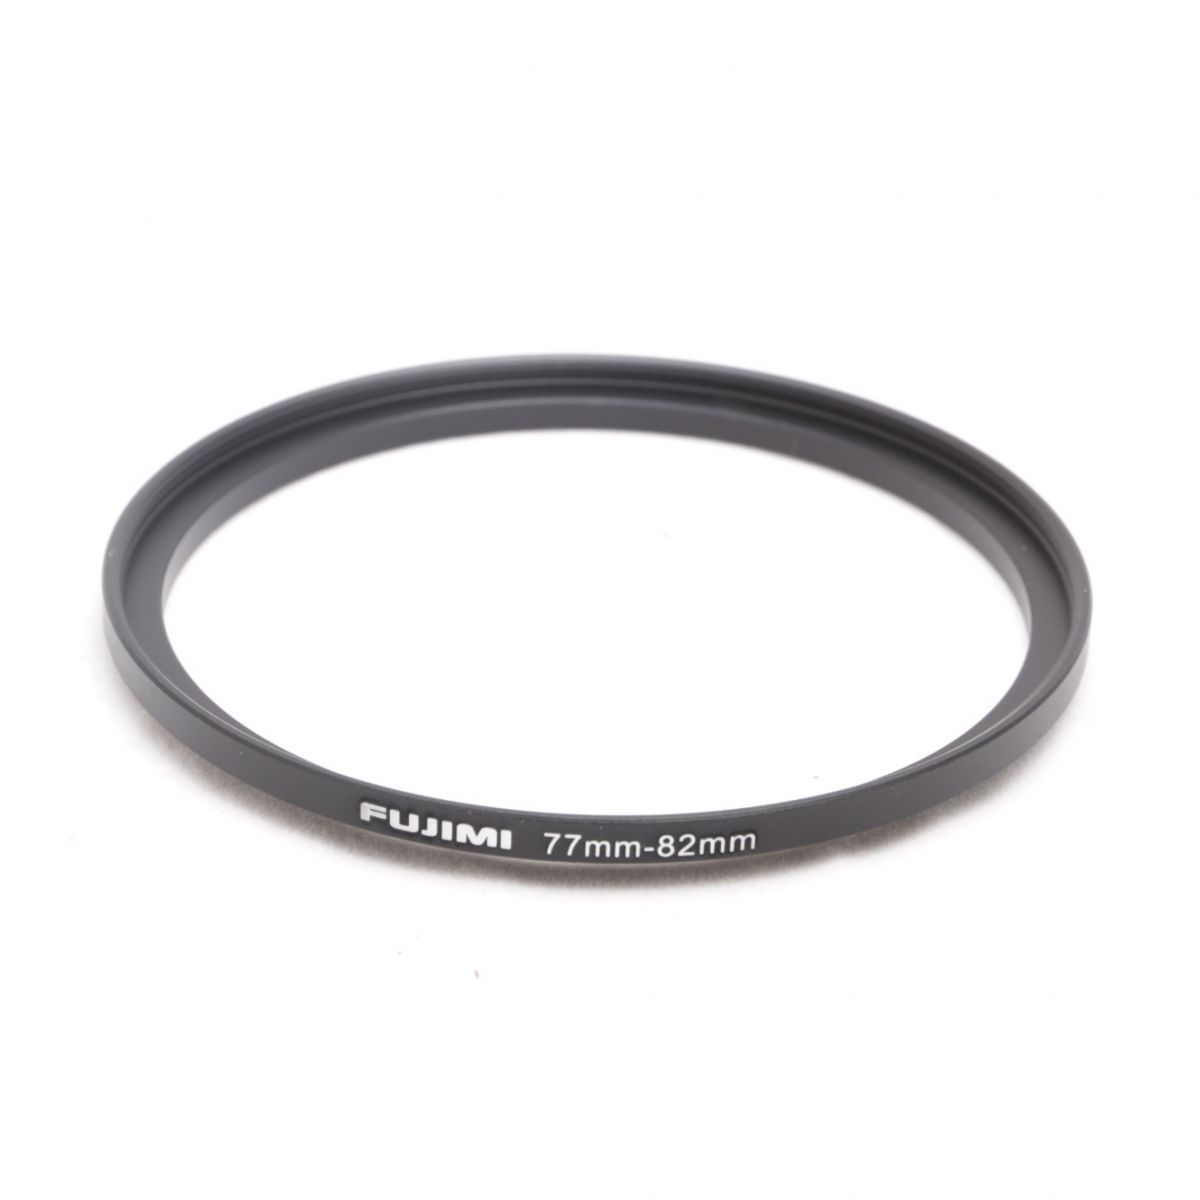 Переходное кольцо Fujimi FRSU-4952 Step-Up Размер 49-52 мм